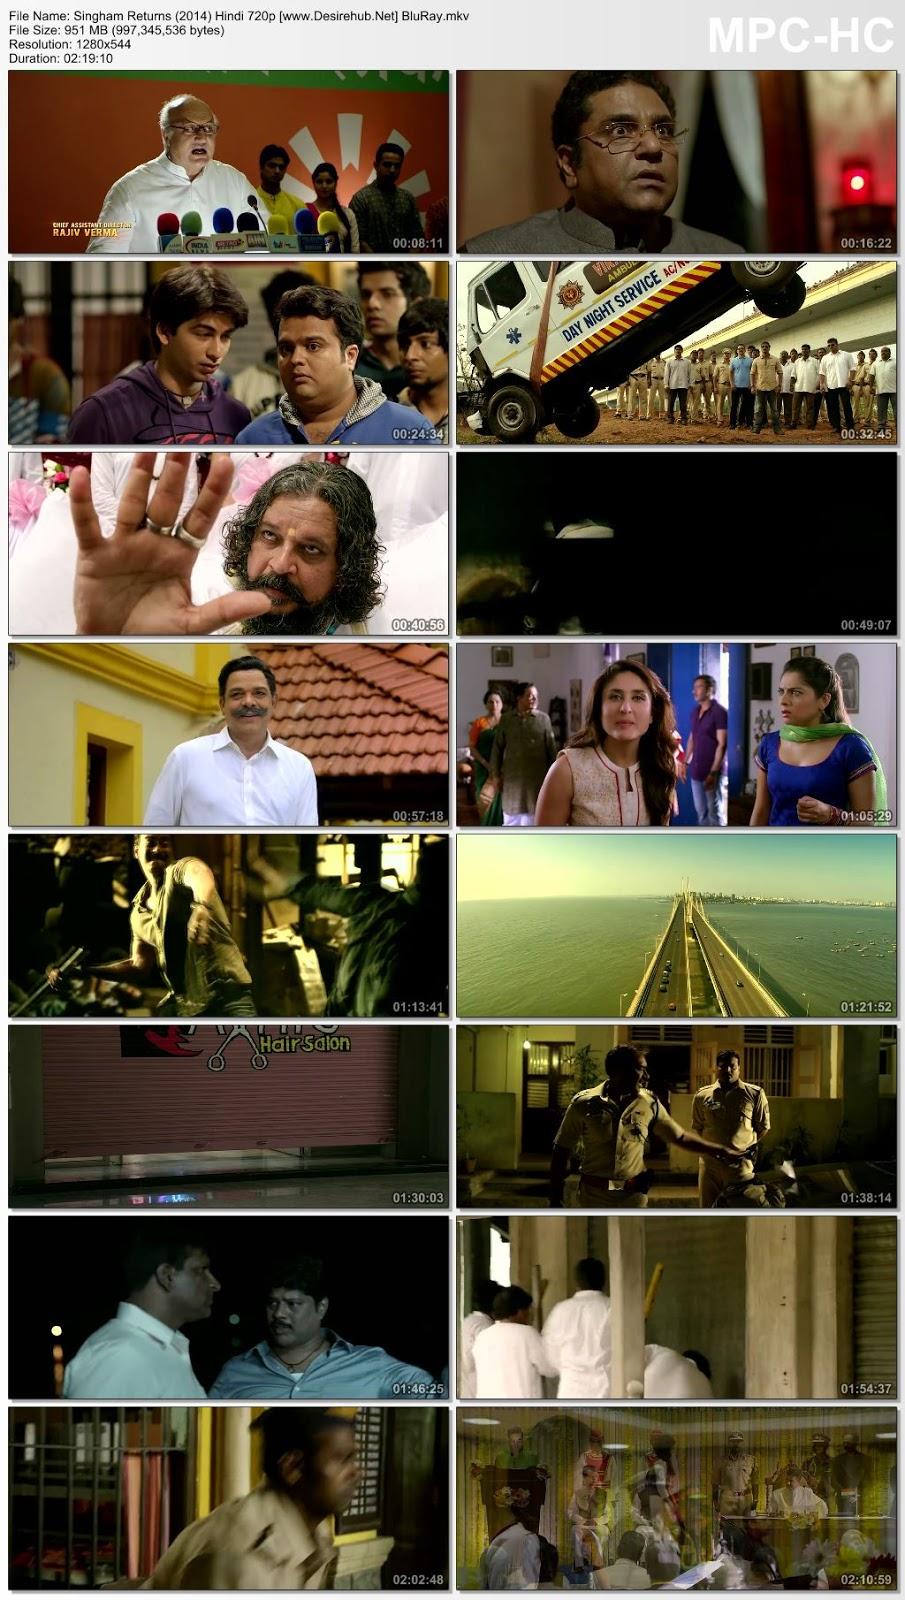 Singham Returns (2014) Hindi 720p BluRay – 950MB Desirehub